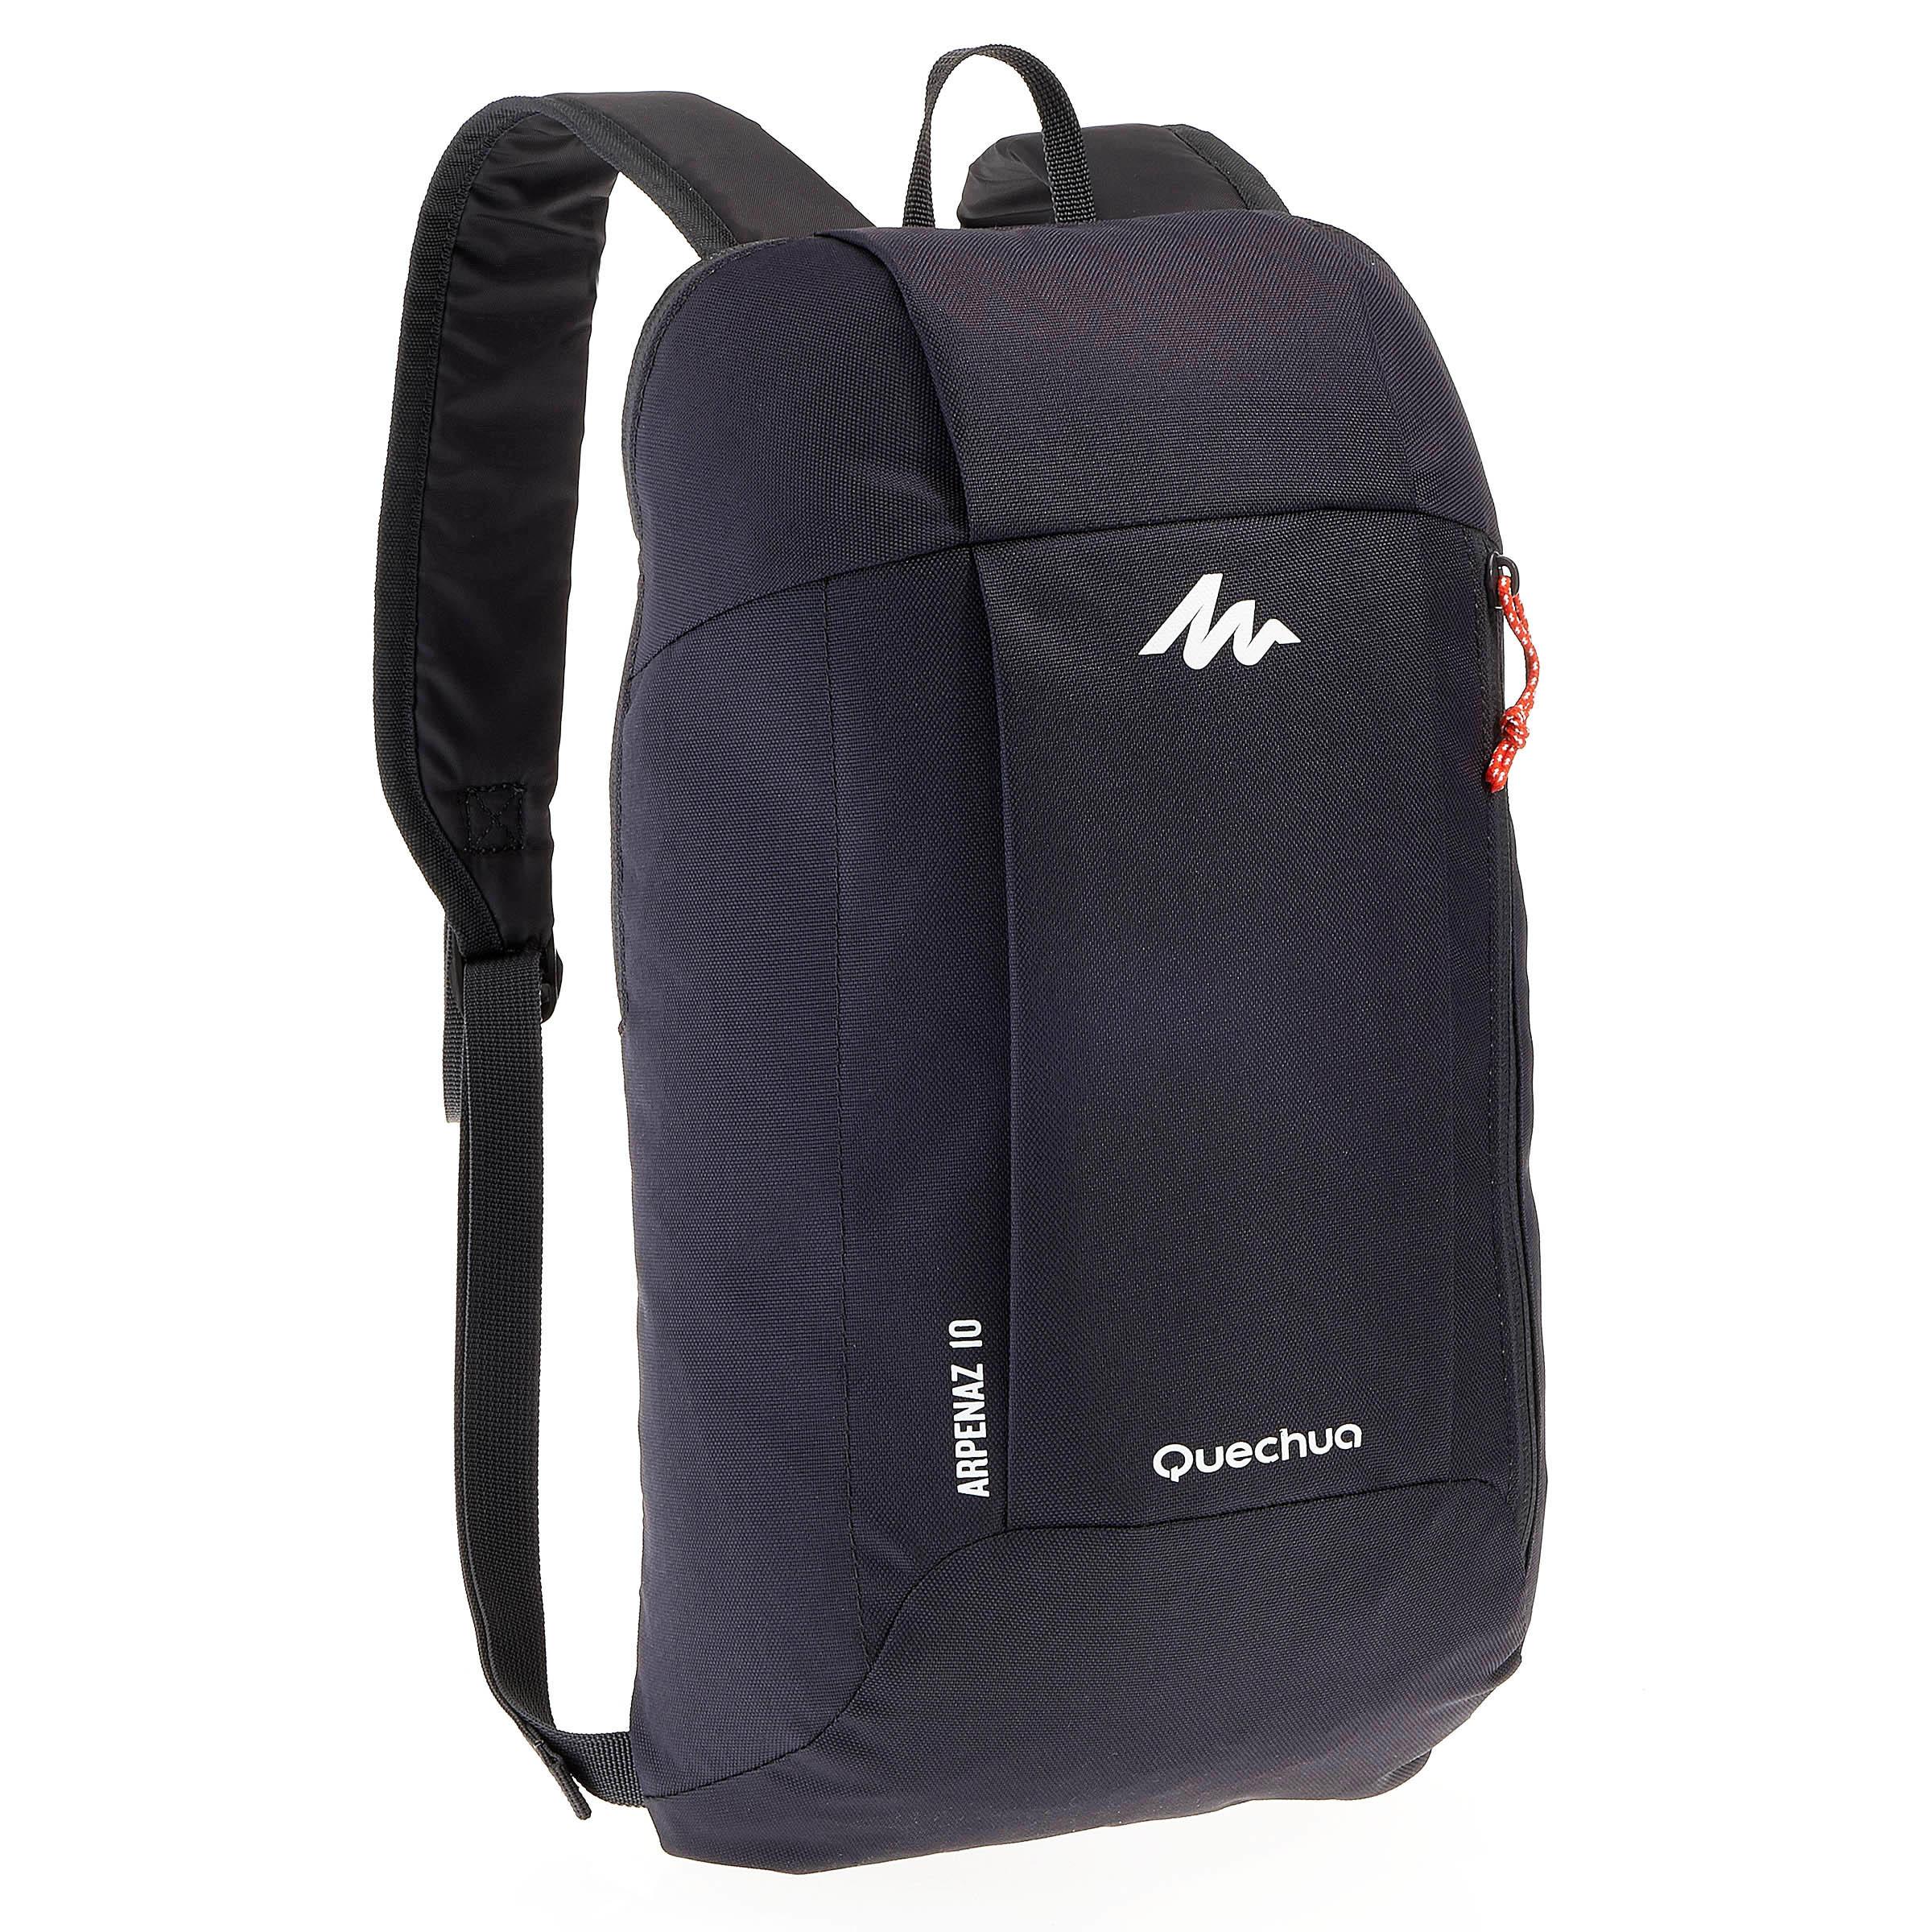 Arpenaz 10 L day hiking backpack - black